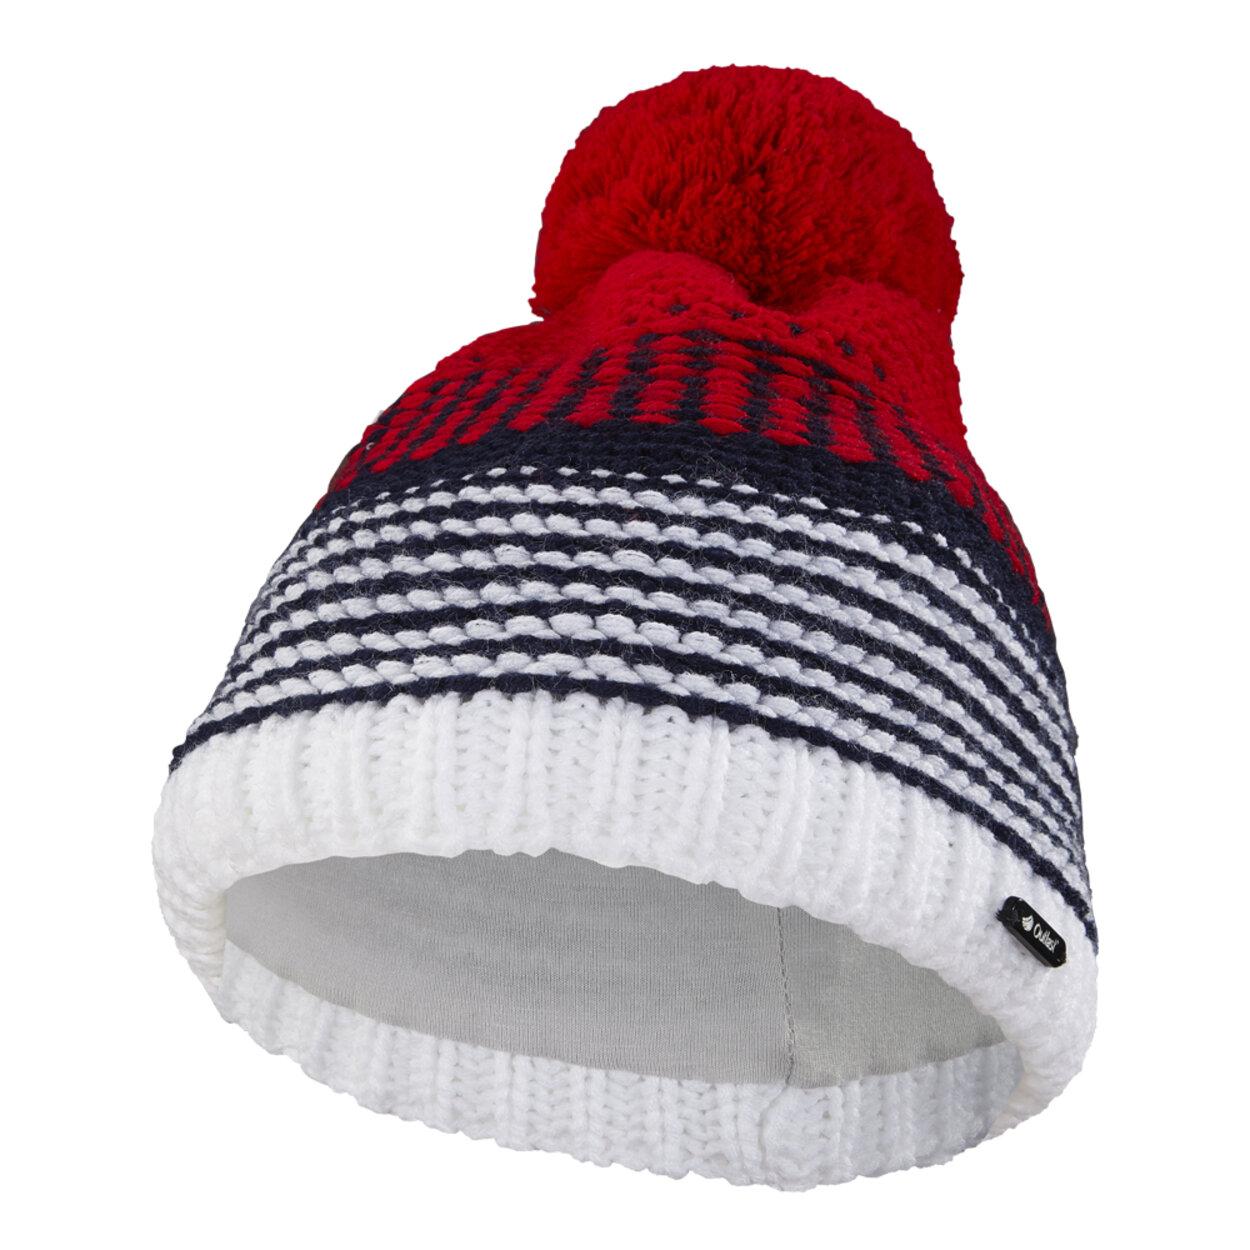 4e45ee8e1 Čiapka pletená pruhovaná Outlast ® veľ.5,49-53cm bielomodročervená little  angel